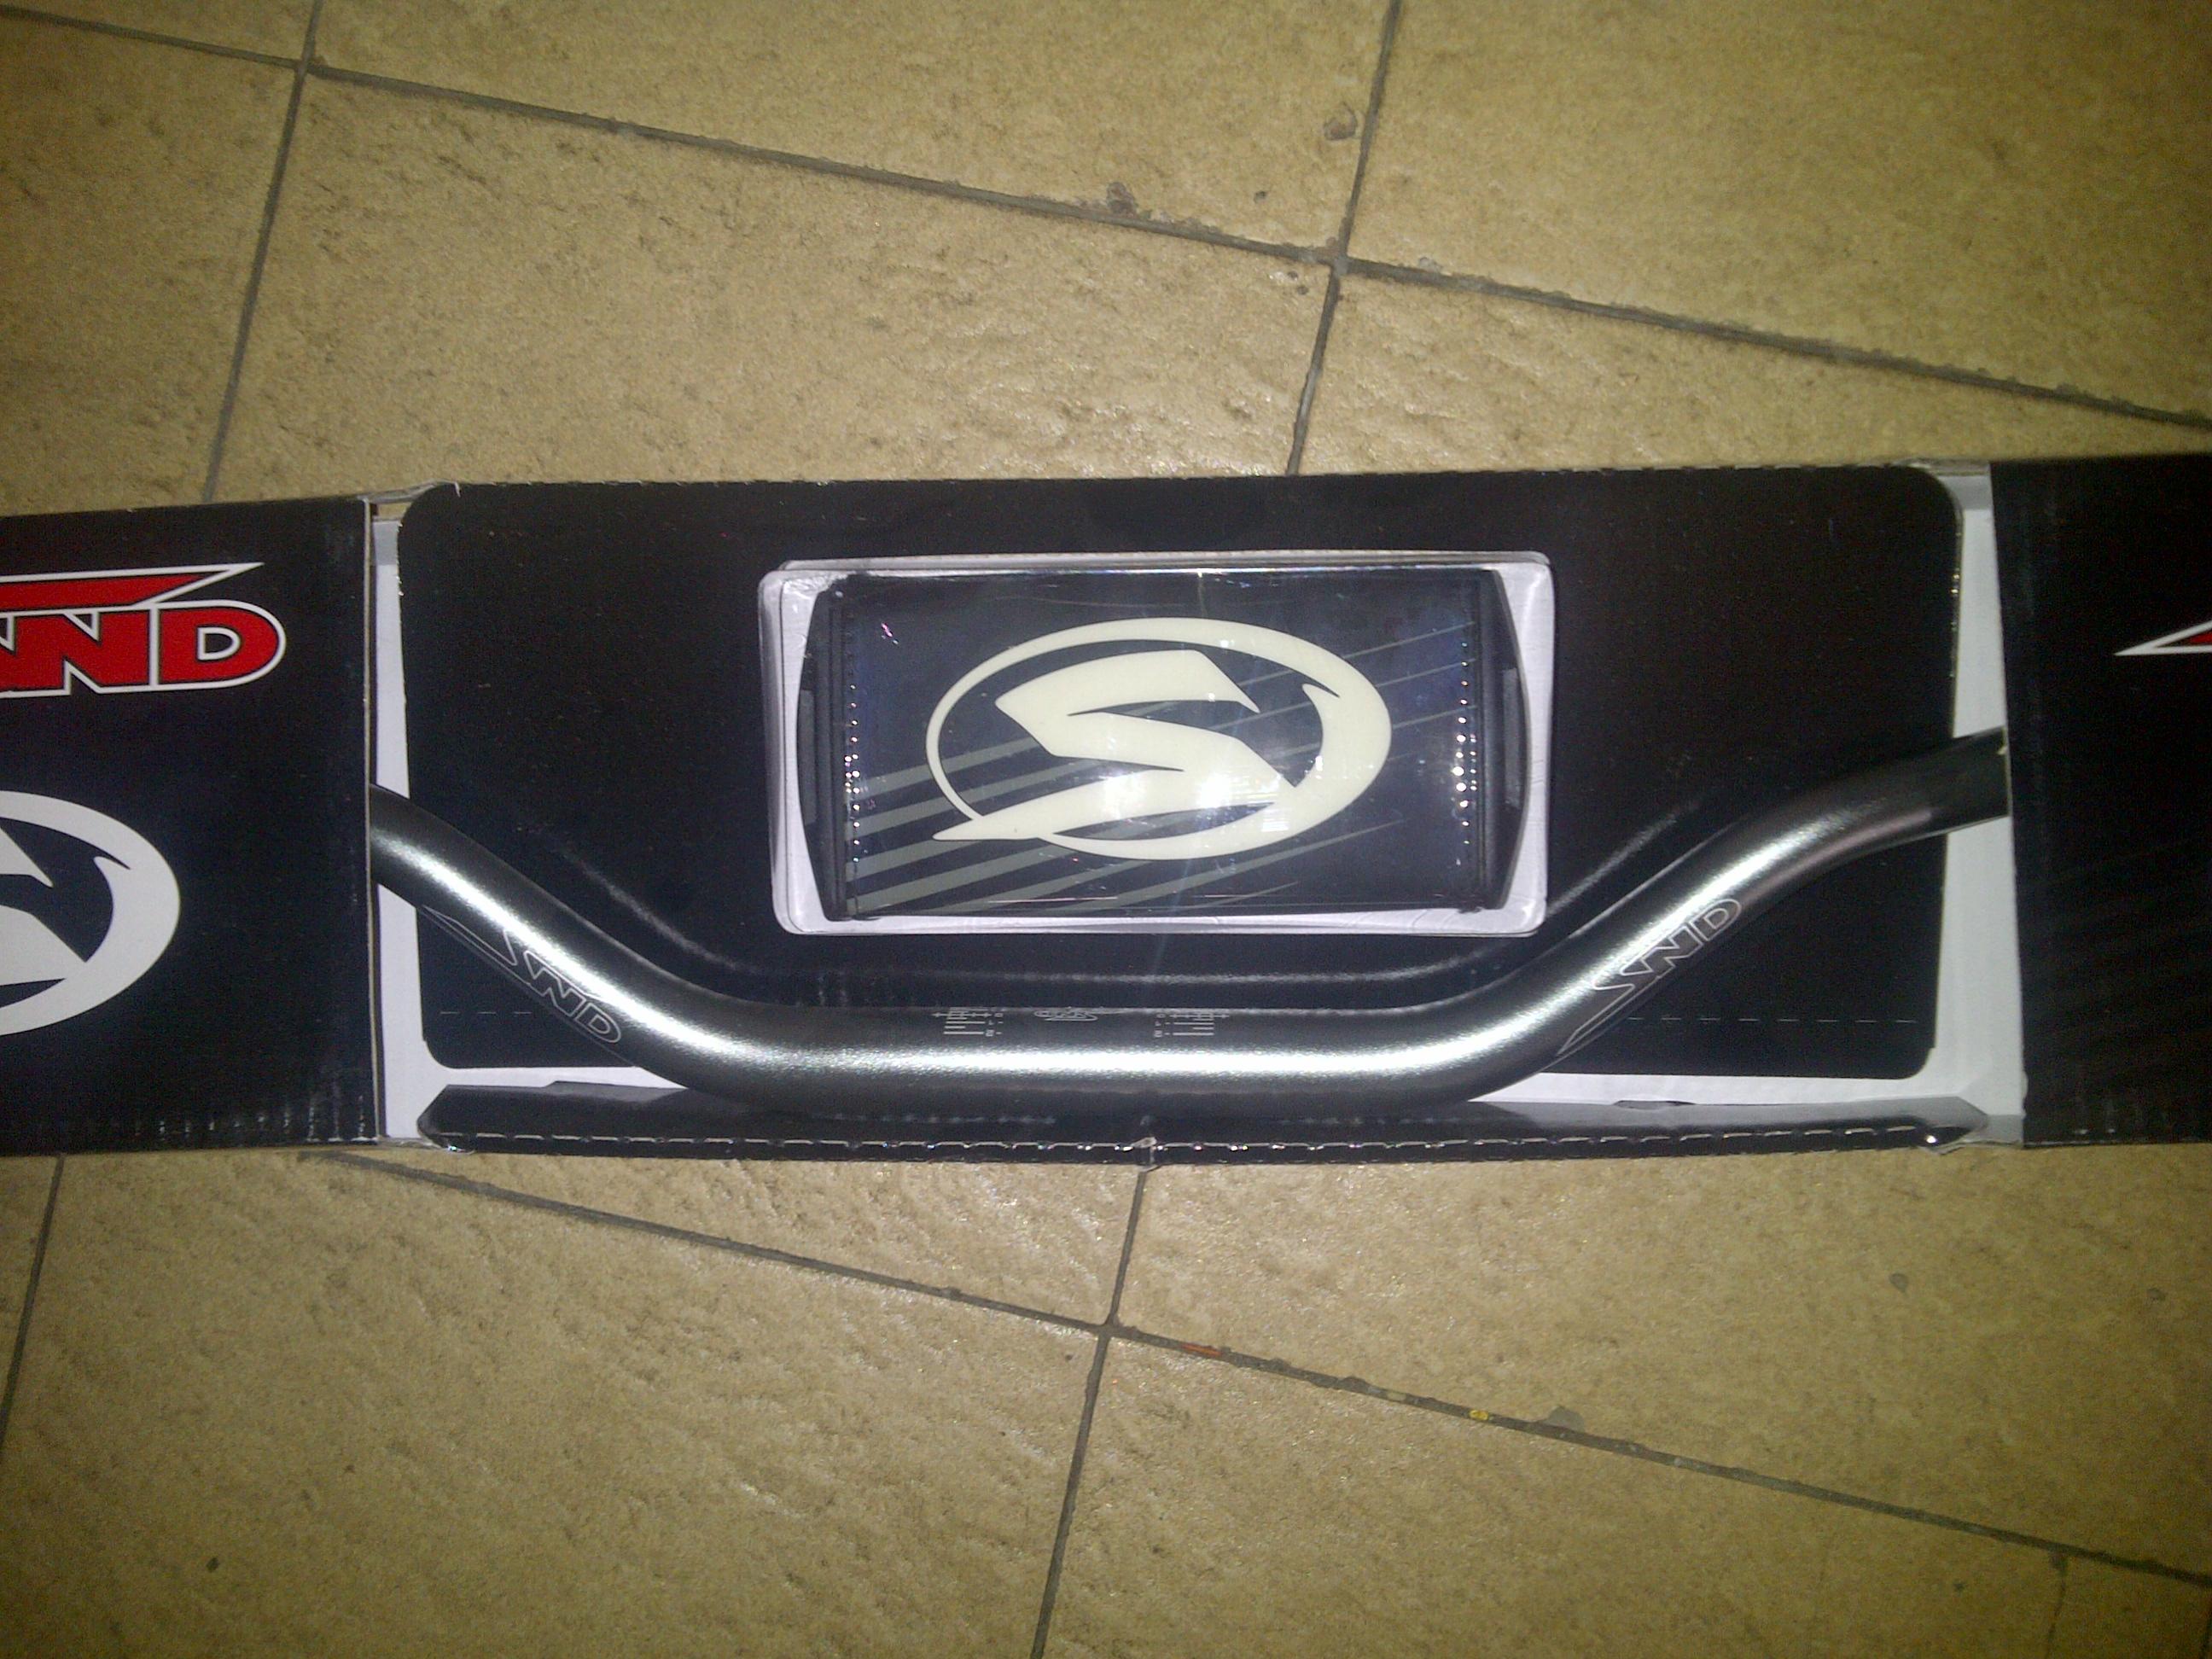 Kebon Jeruk 20130716 00584 Jual handle bar merk SND